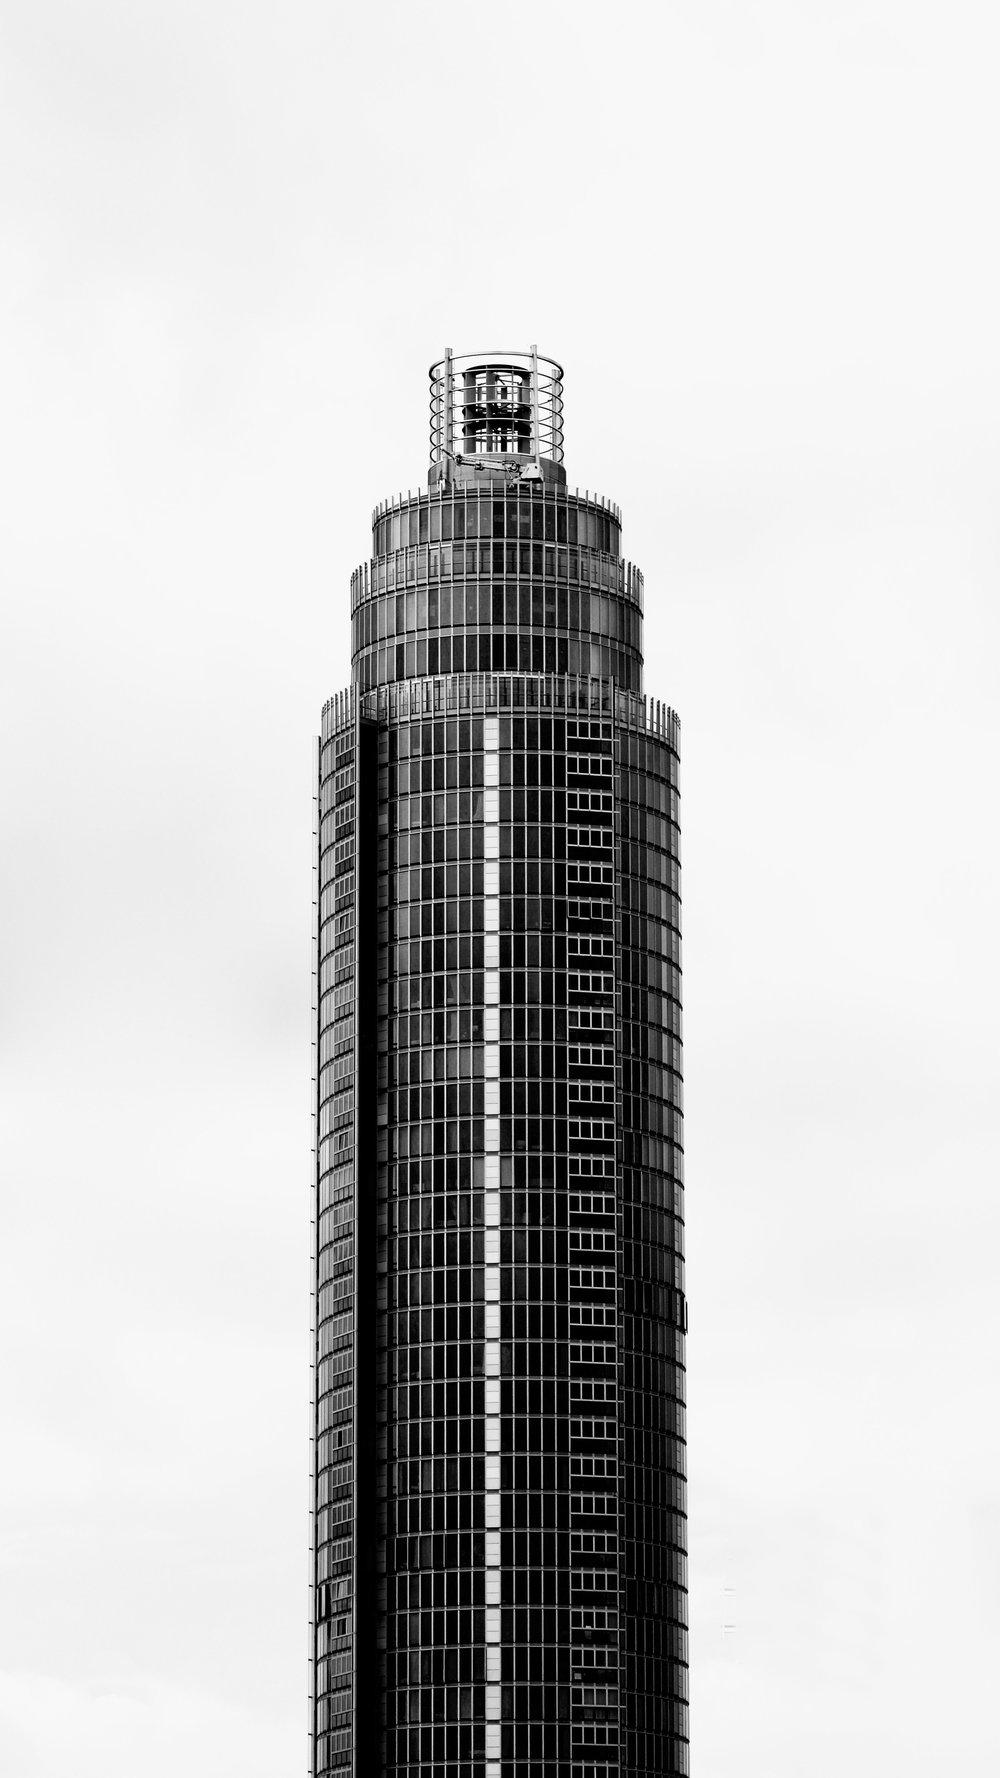 St George Wharf Tower